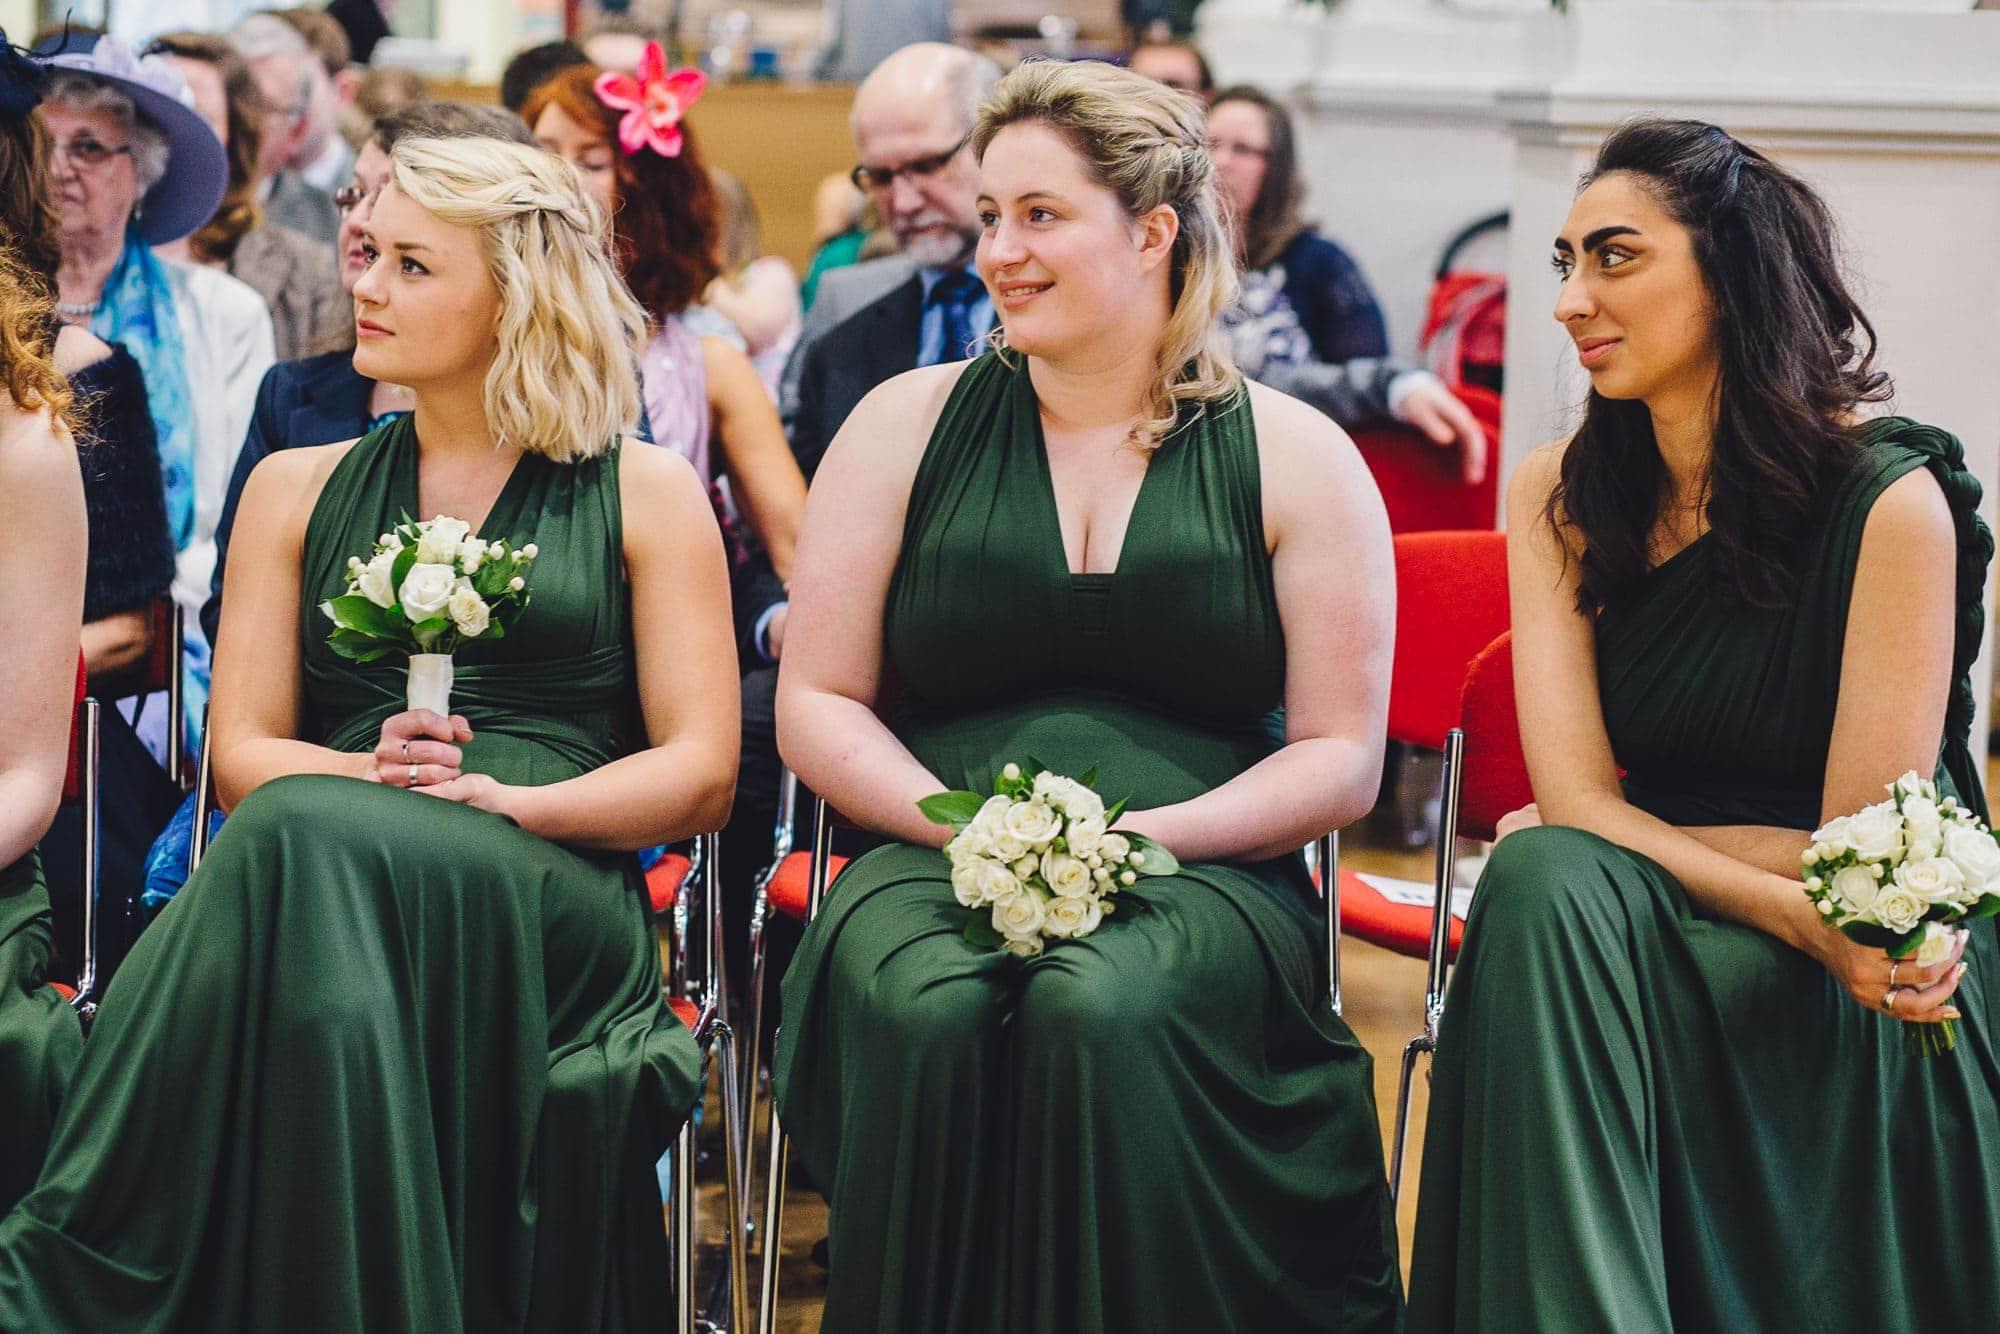 Matlt-Cross-Nottingham-wedding-Photography-29